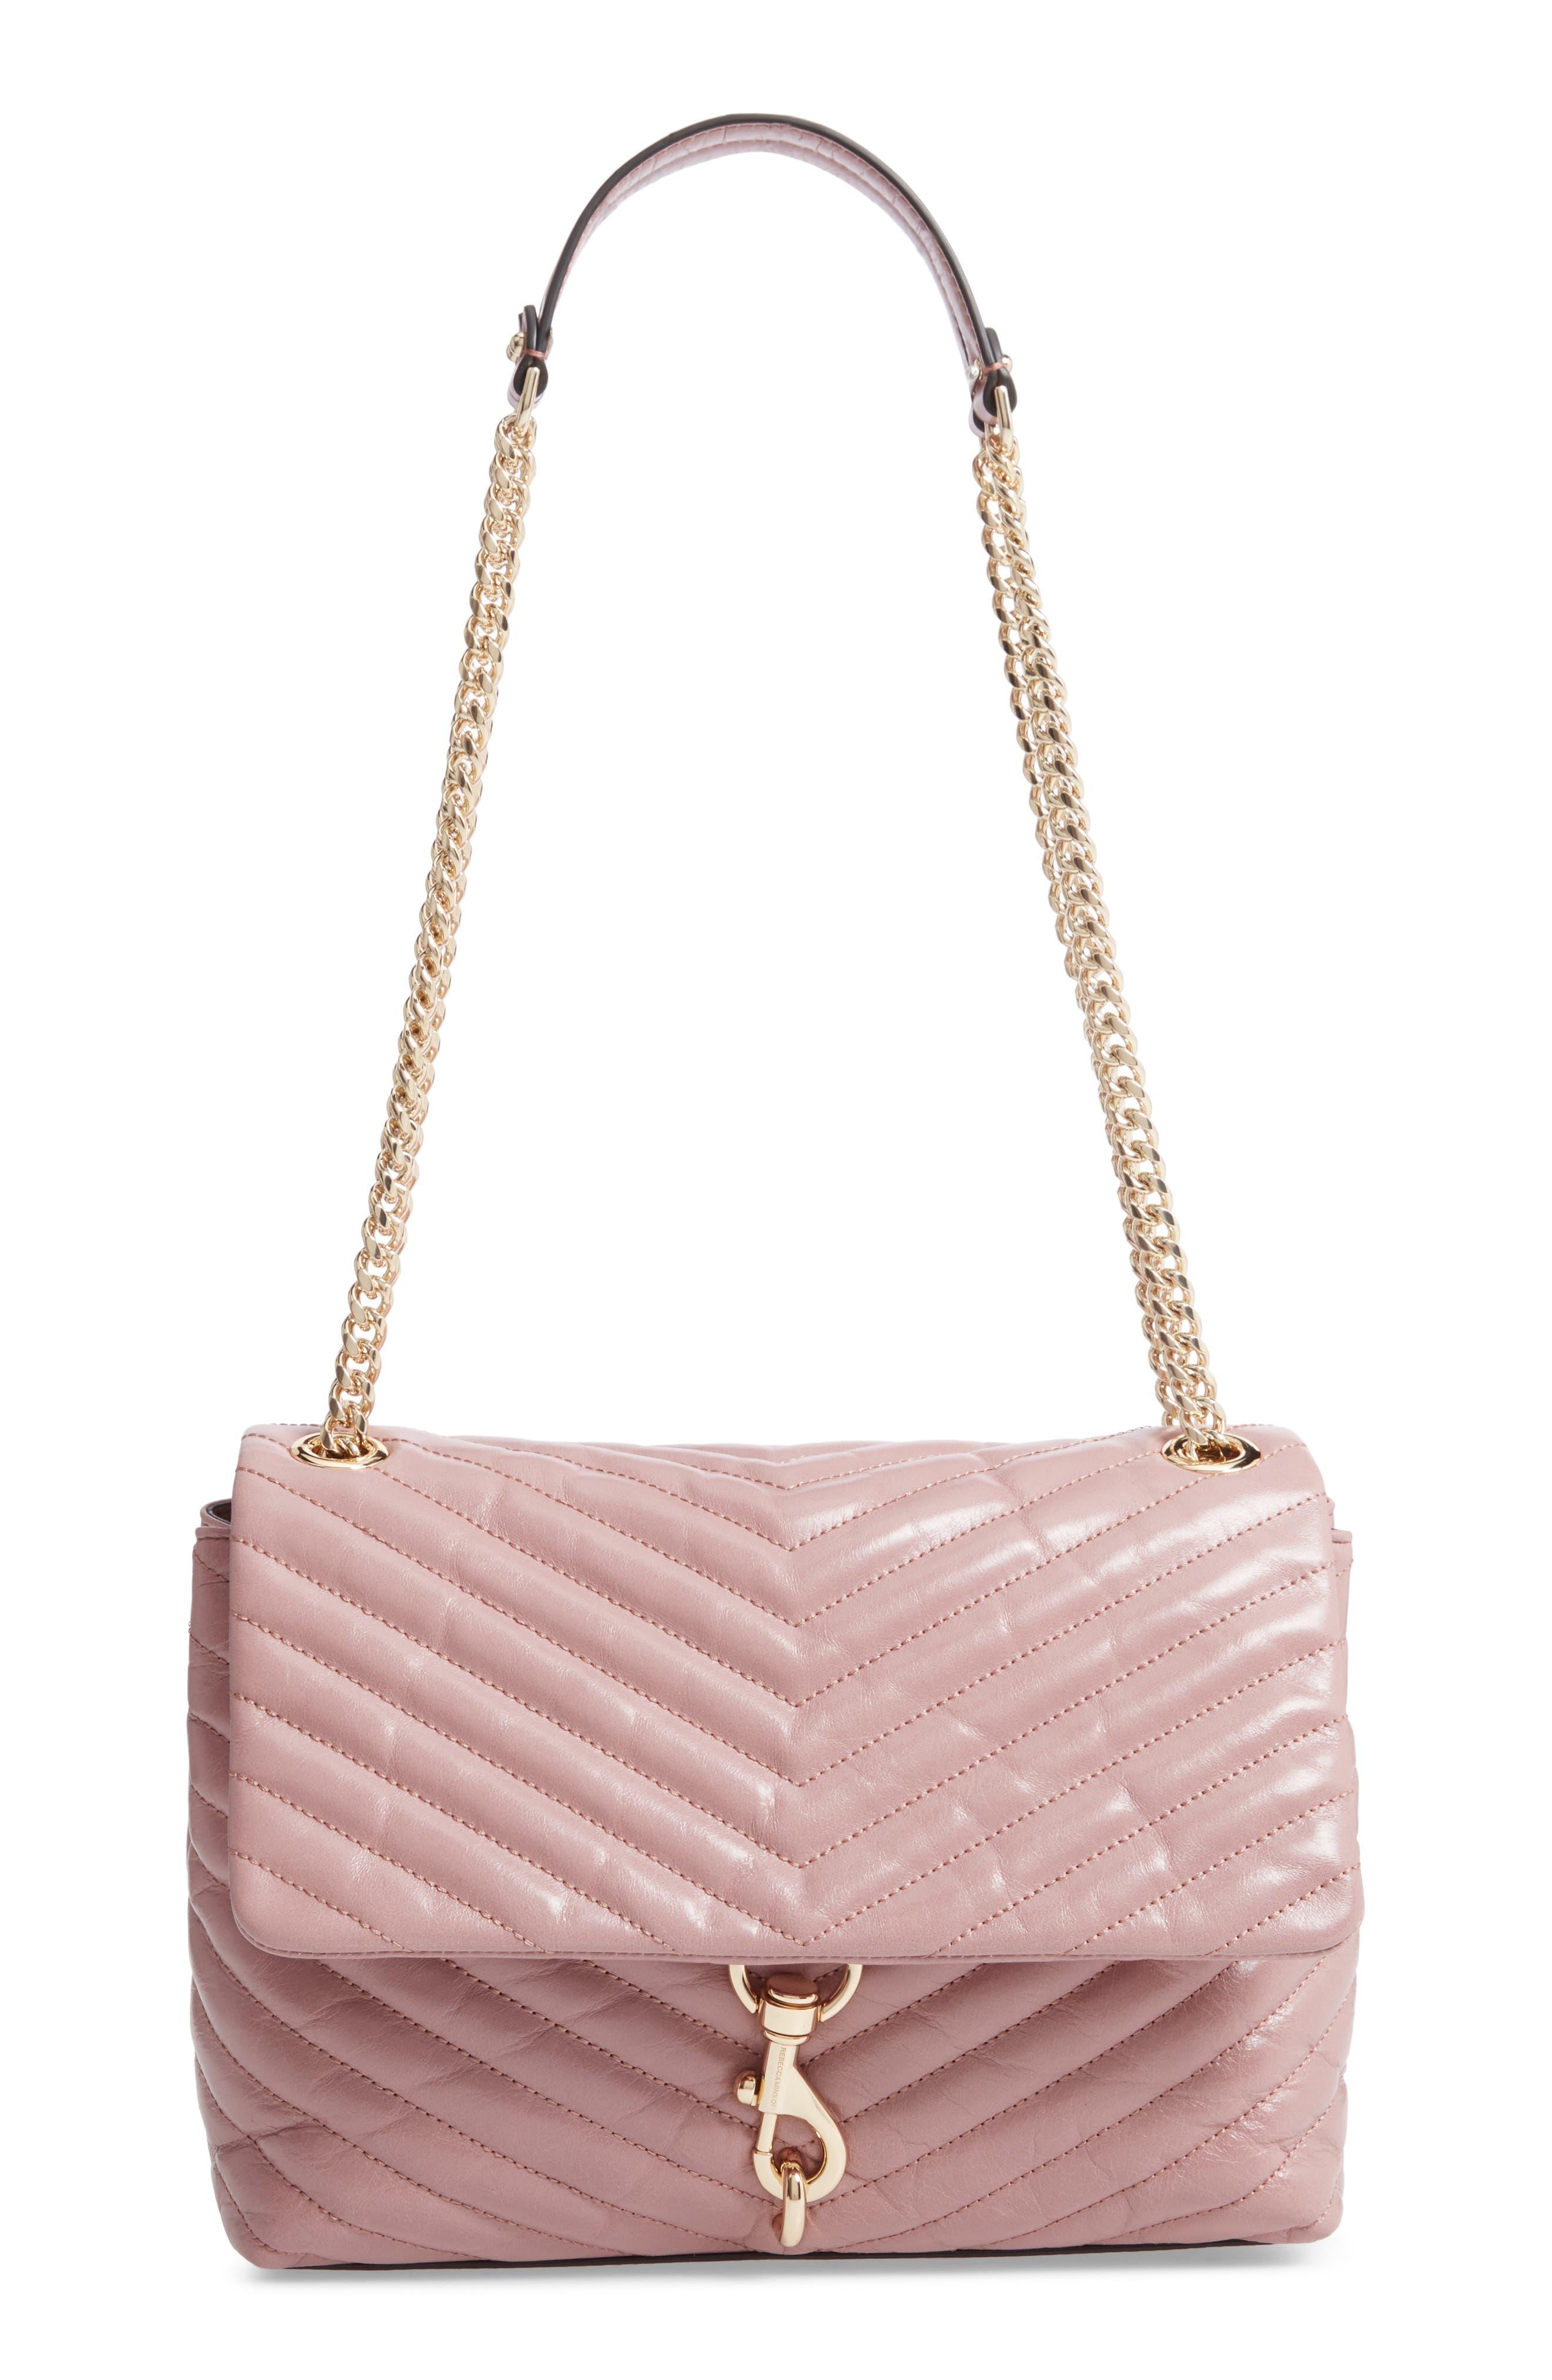 Edie Flap Front Leather Shoulder Bag - Brown in Mink